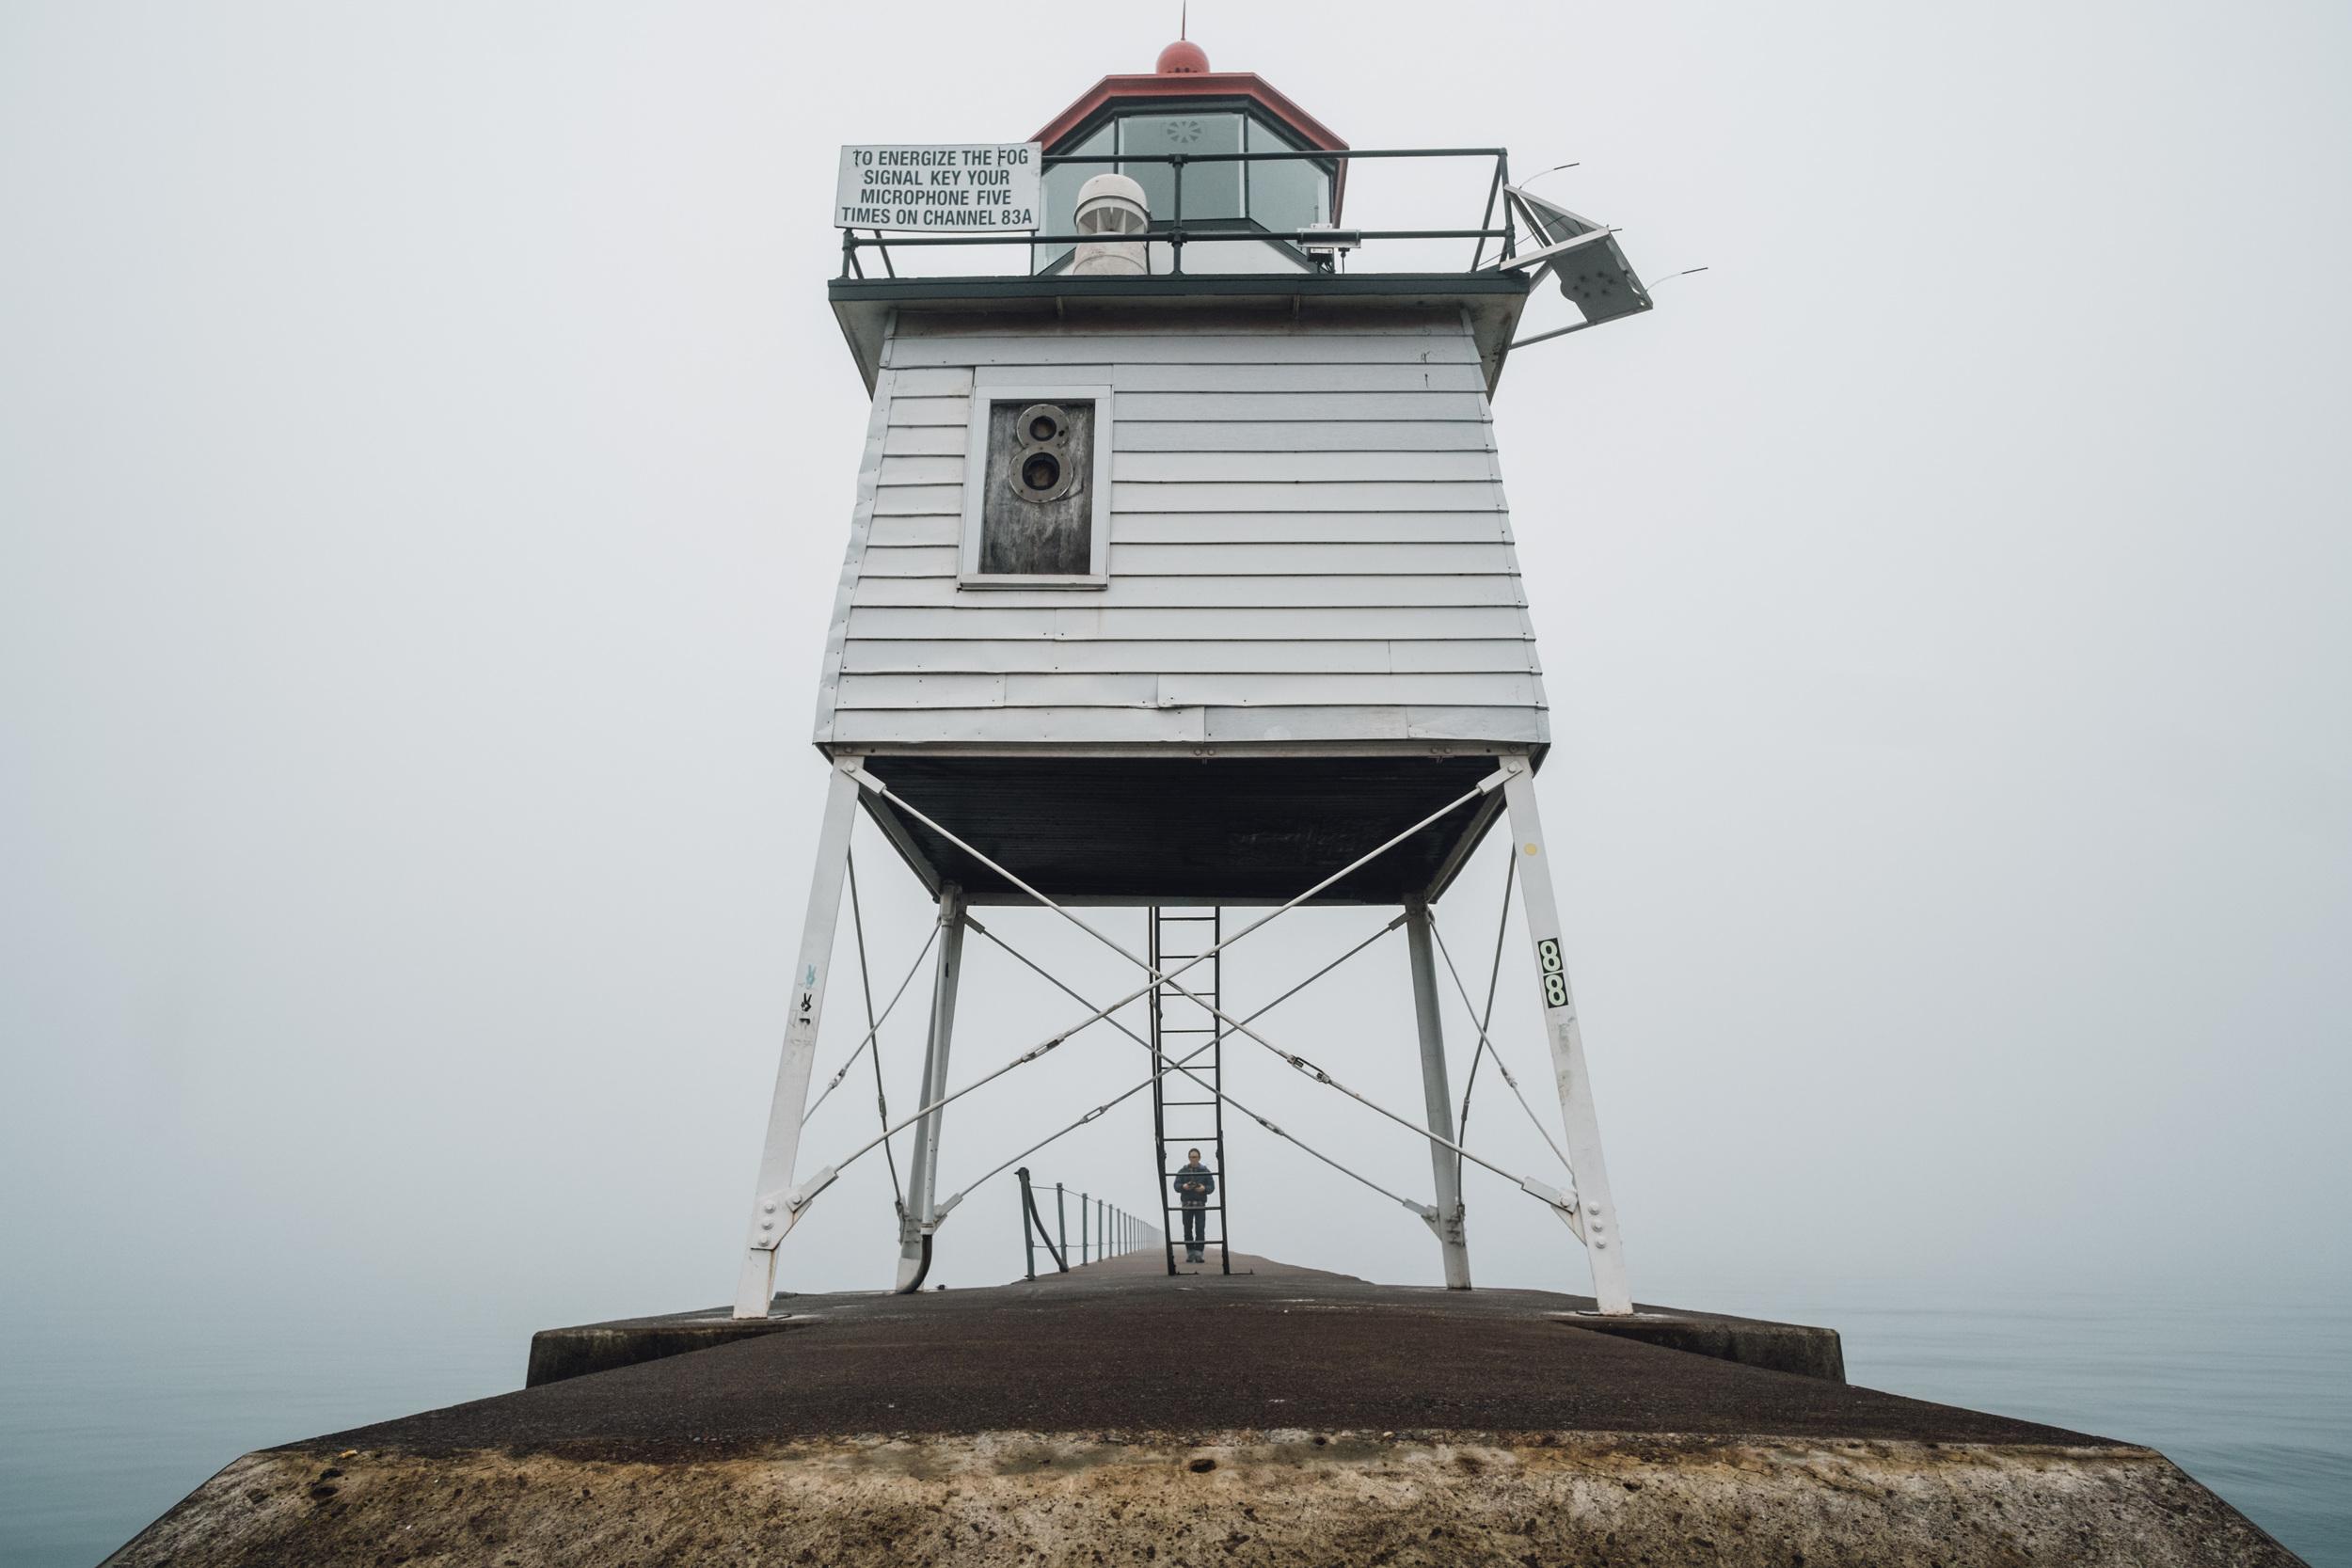 north shore-004.jpg